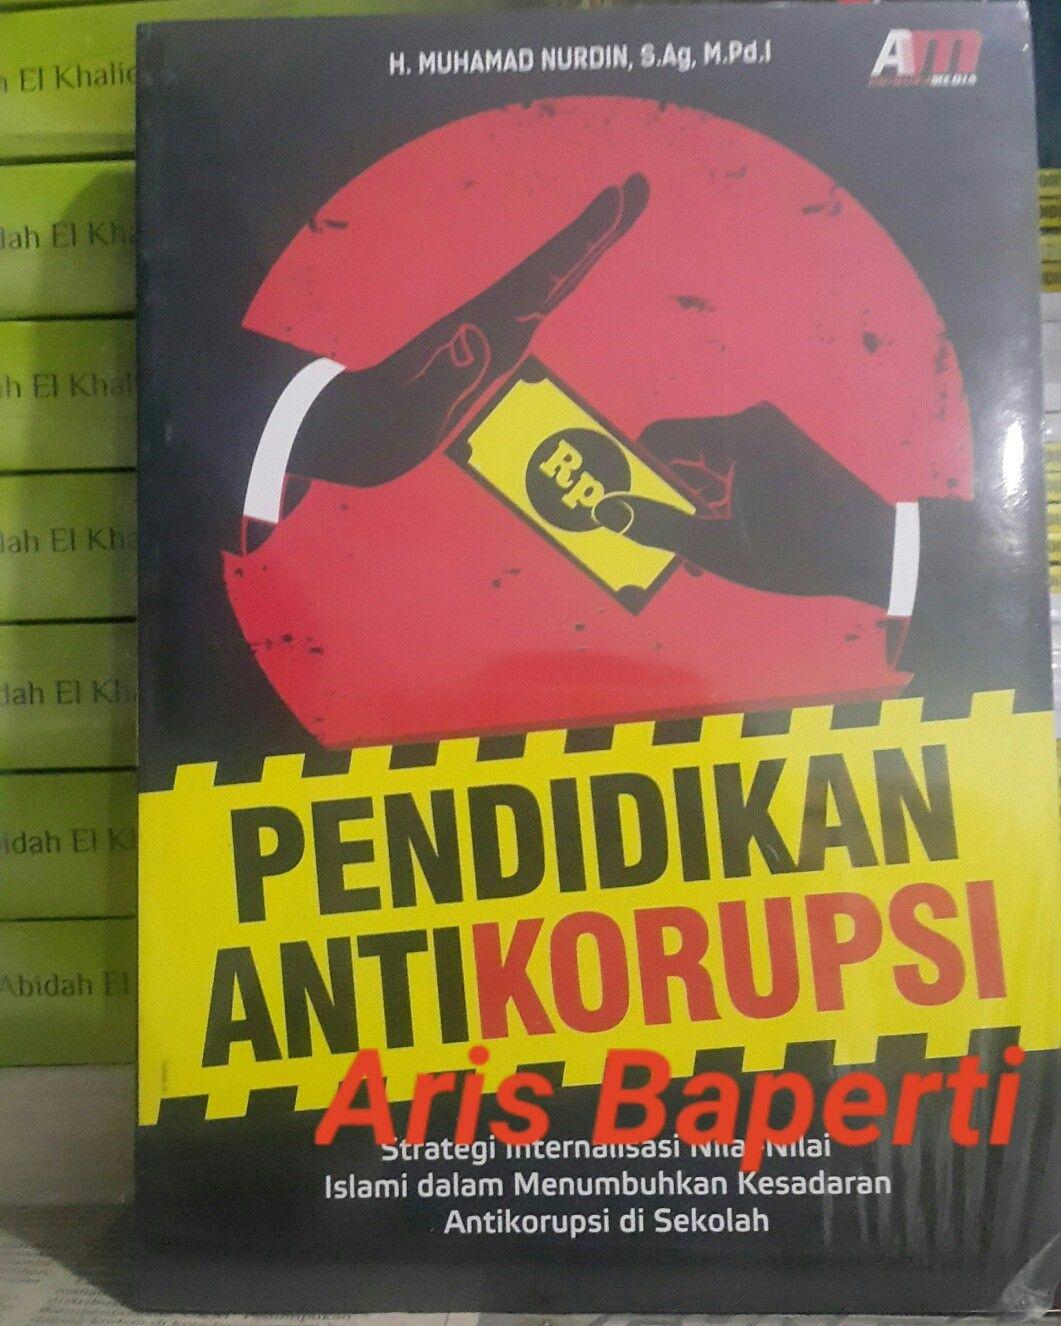 Pendidikan Antikorupsi Strategi Internalisasi Nilai Nilai Islami Dalam Menumbuhkan Kesadaran Antikorupsi Di Sekolah Penyusun H Muha Pendidikan Sekolah Buku